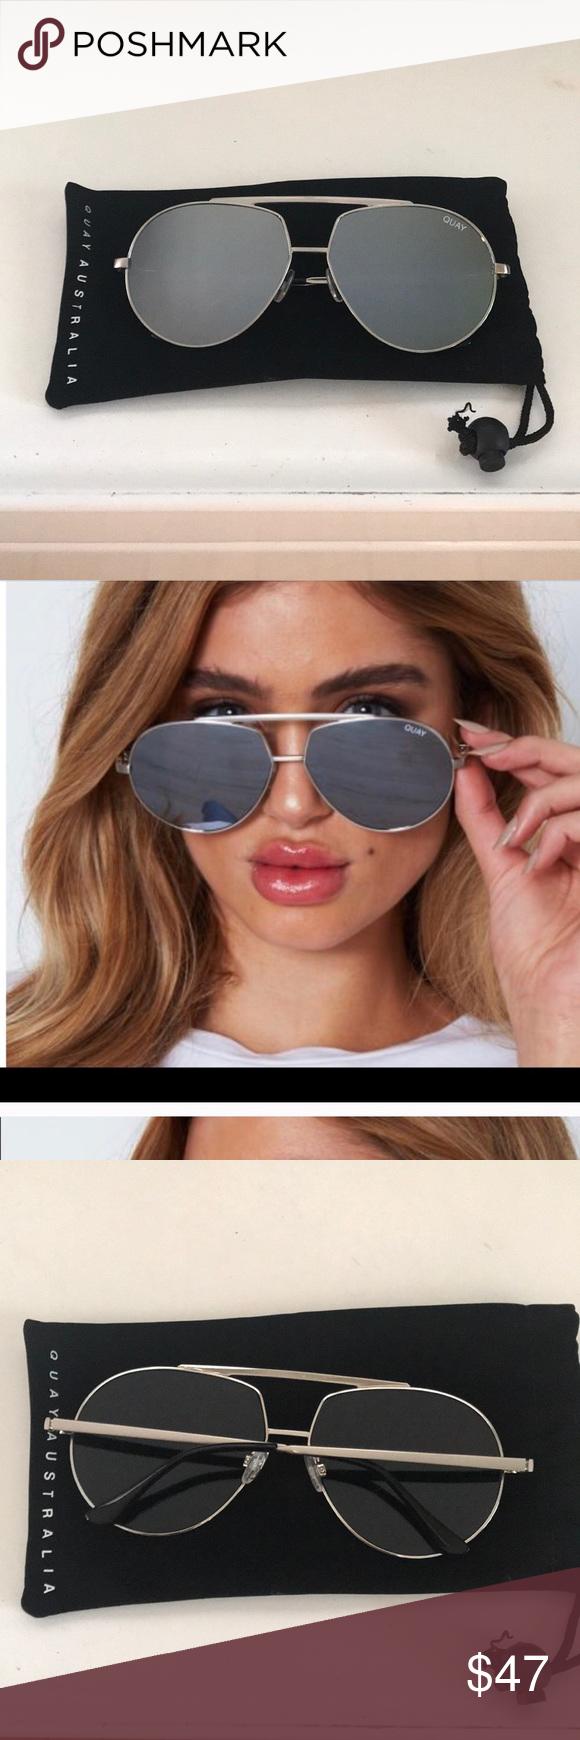 a11d083ef5 Quay Australia Blaze Sunglasses These are silver mirrored Quay Australia  Blaze sunglasses like new condition worn